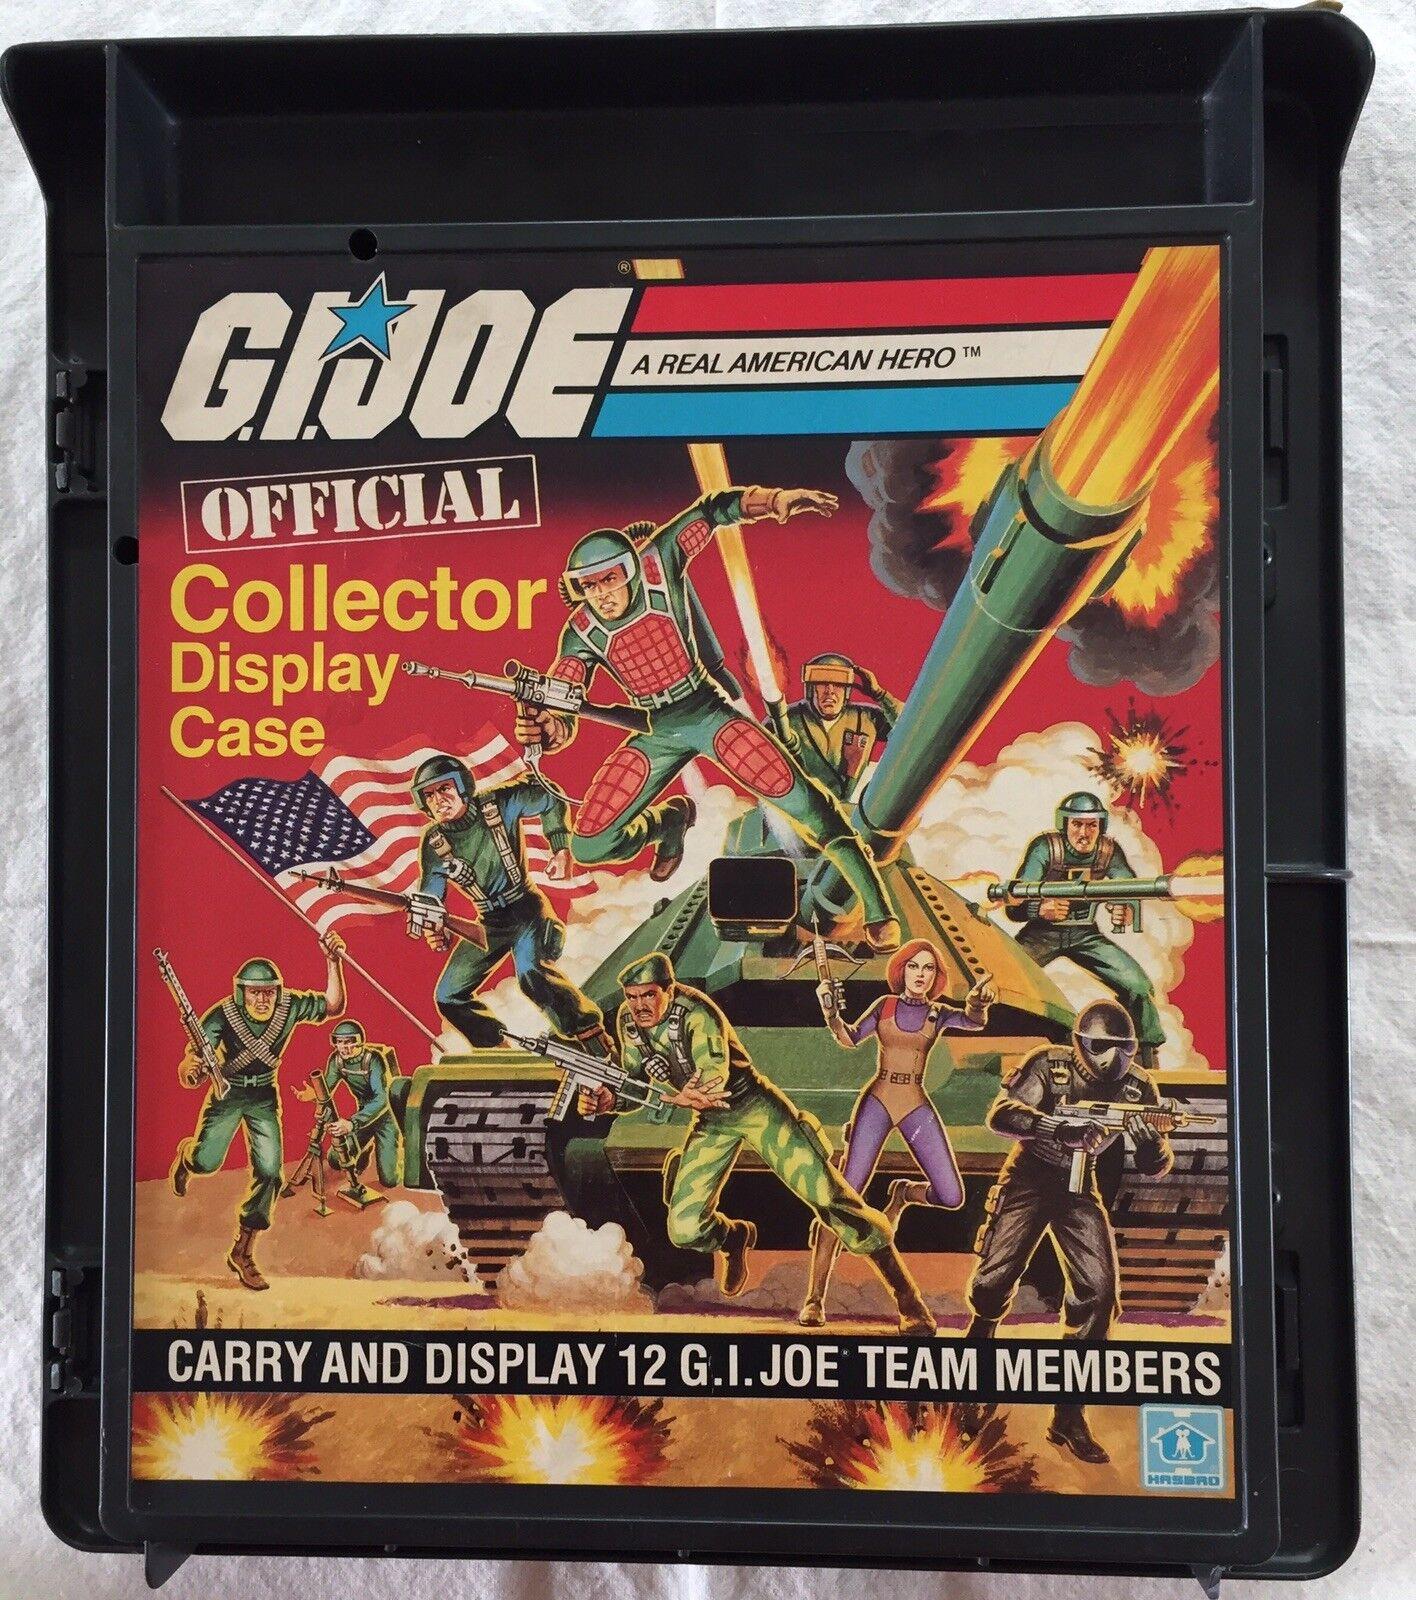 1982 G.I. JOE OFFICIAL COLLECTOR DISPLAY CASE